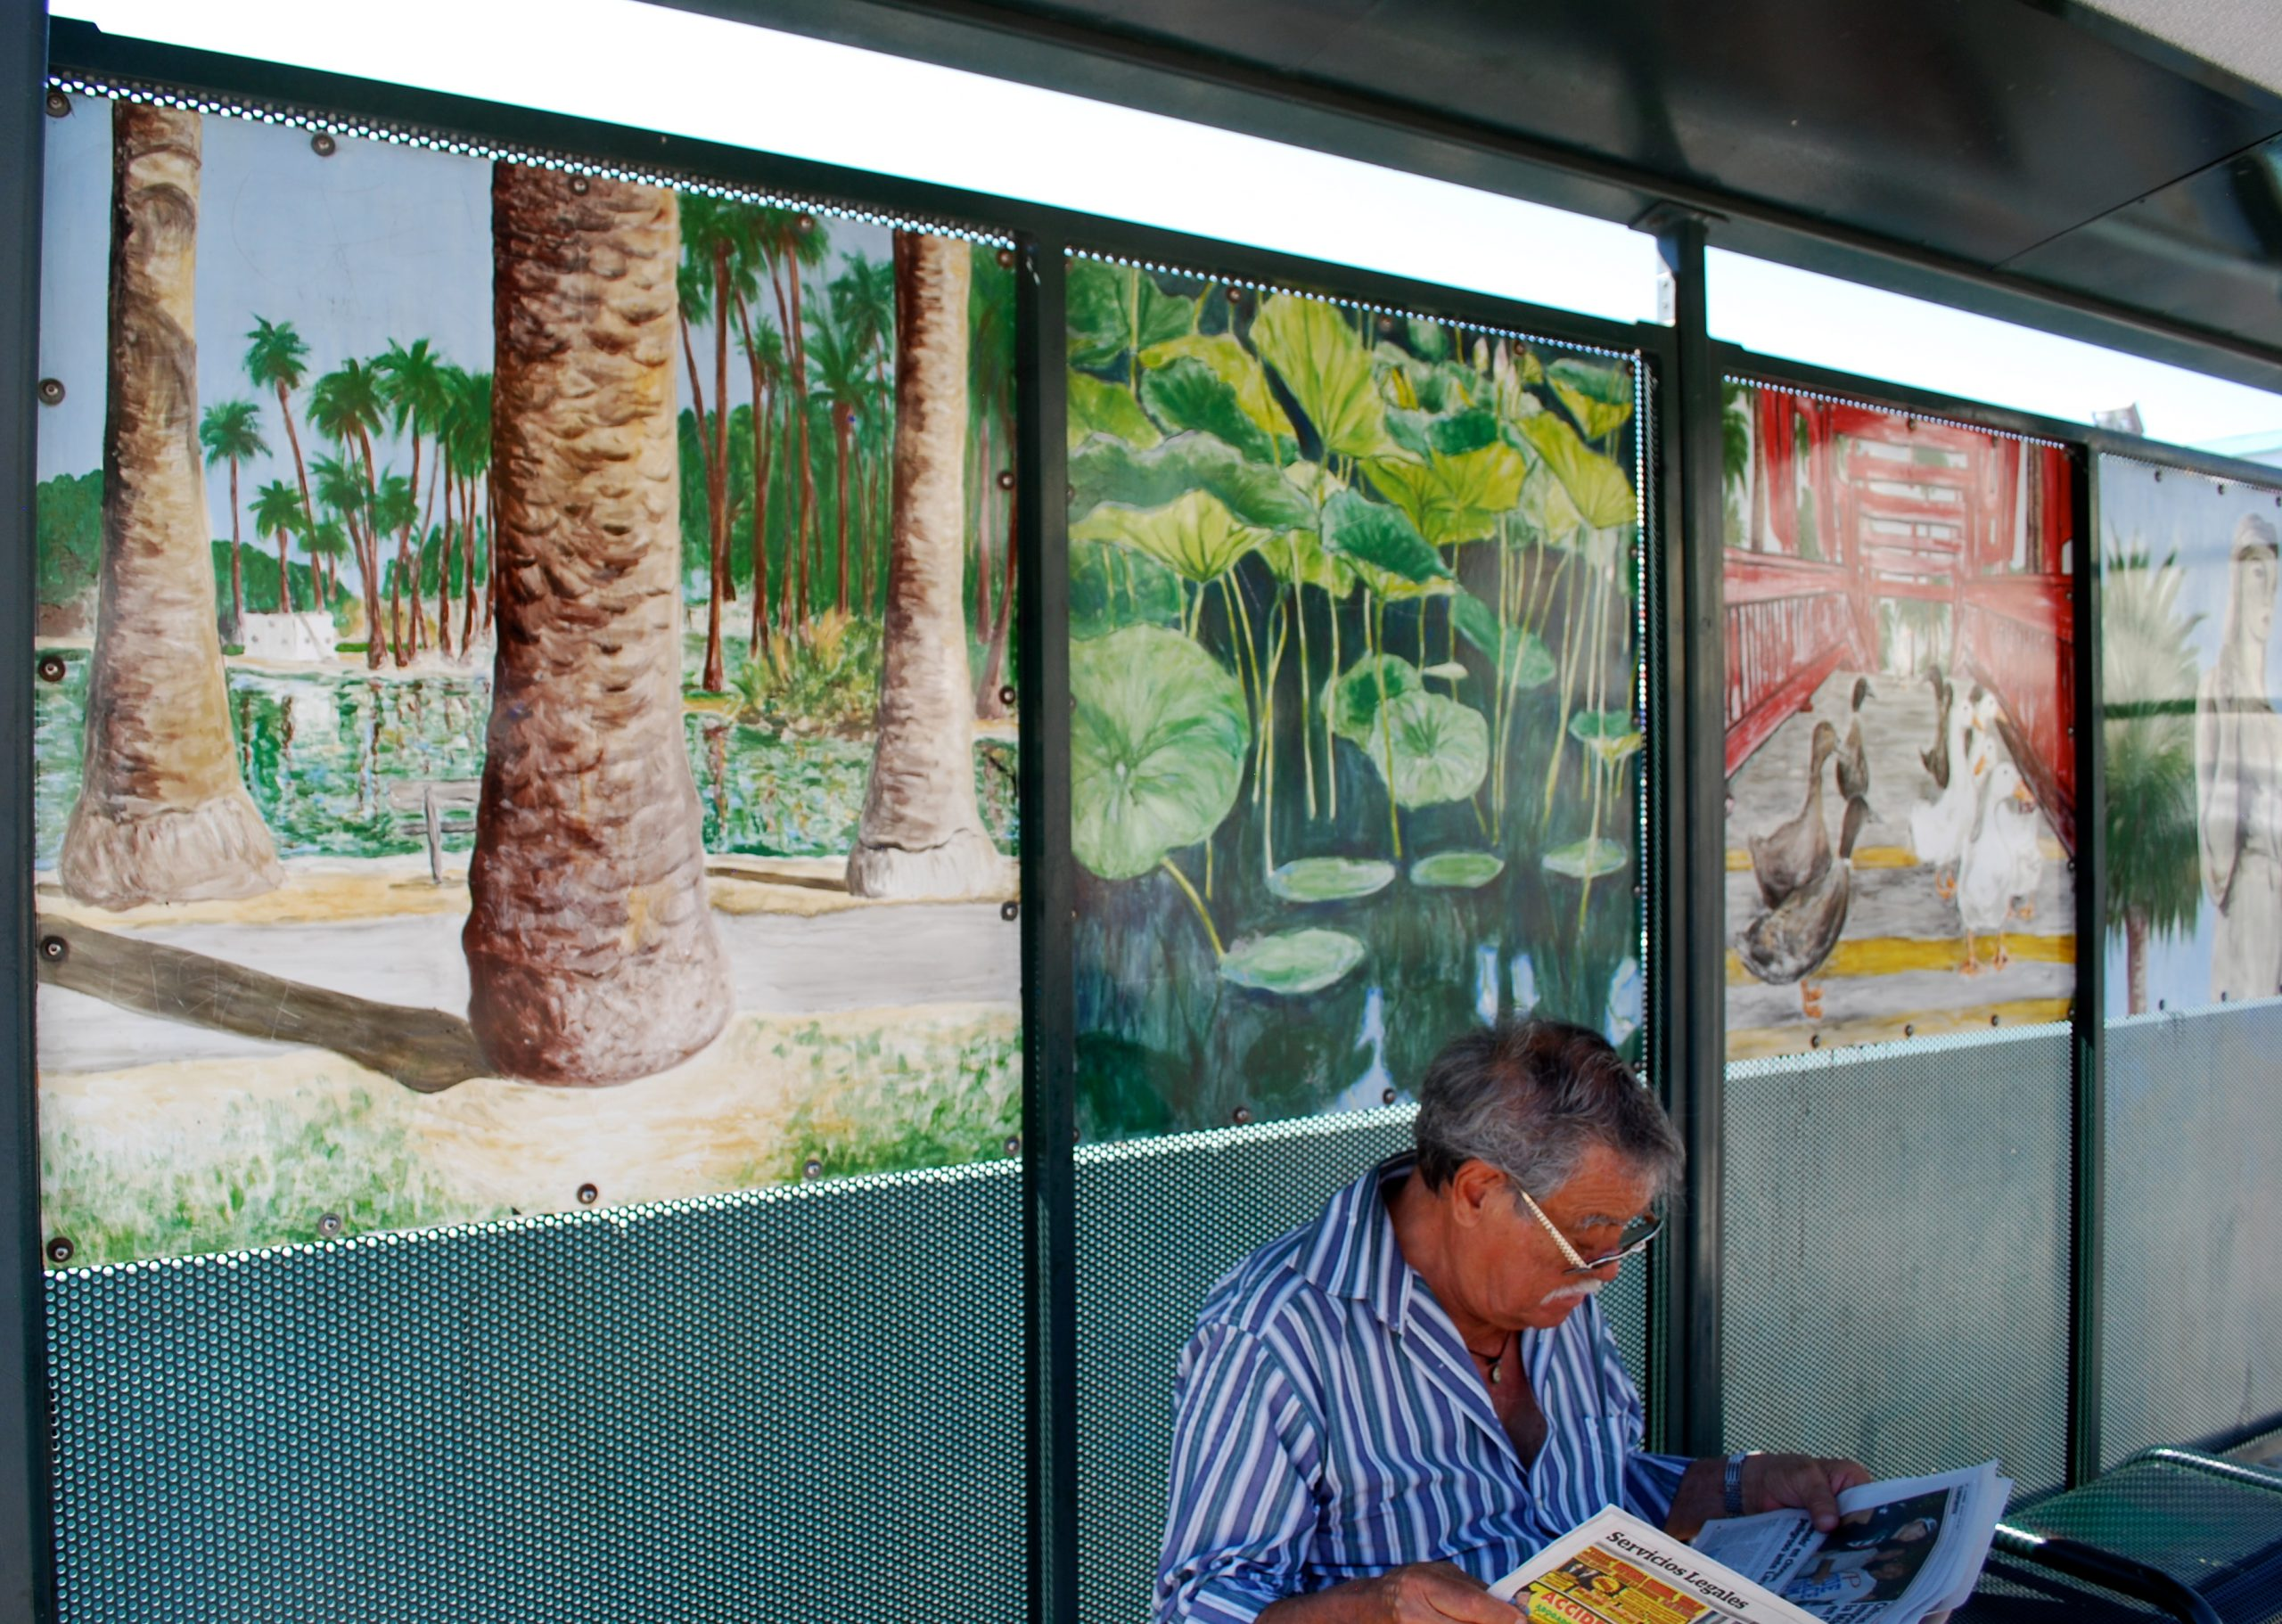 Echo Park Bus Stop Mural